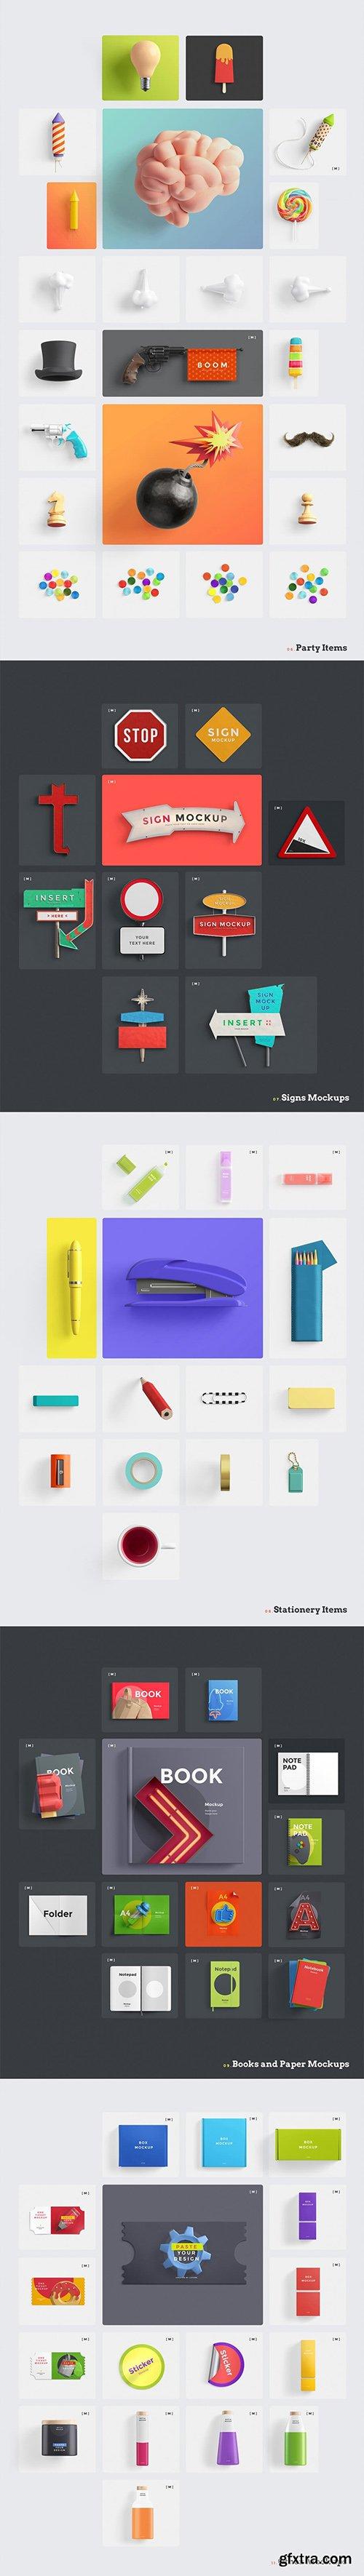 OhMy! Designer's Toolkit Easily Build Creative Scenes in Photoshop